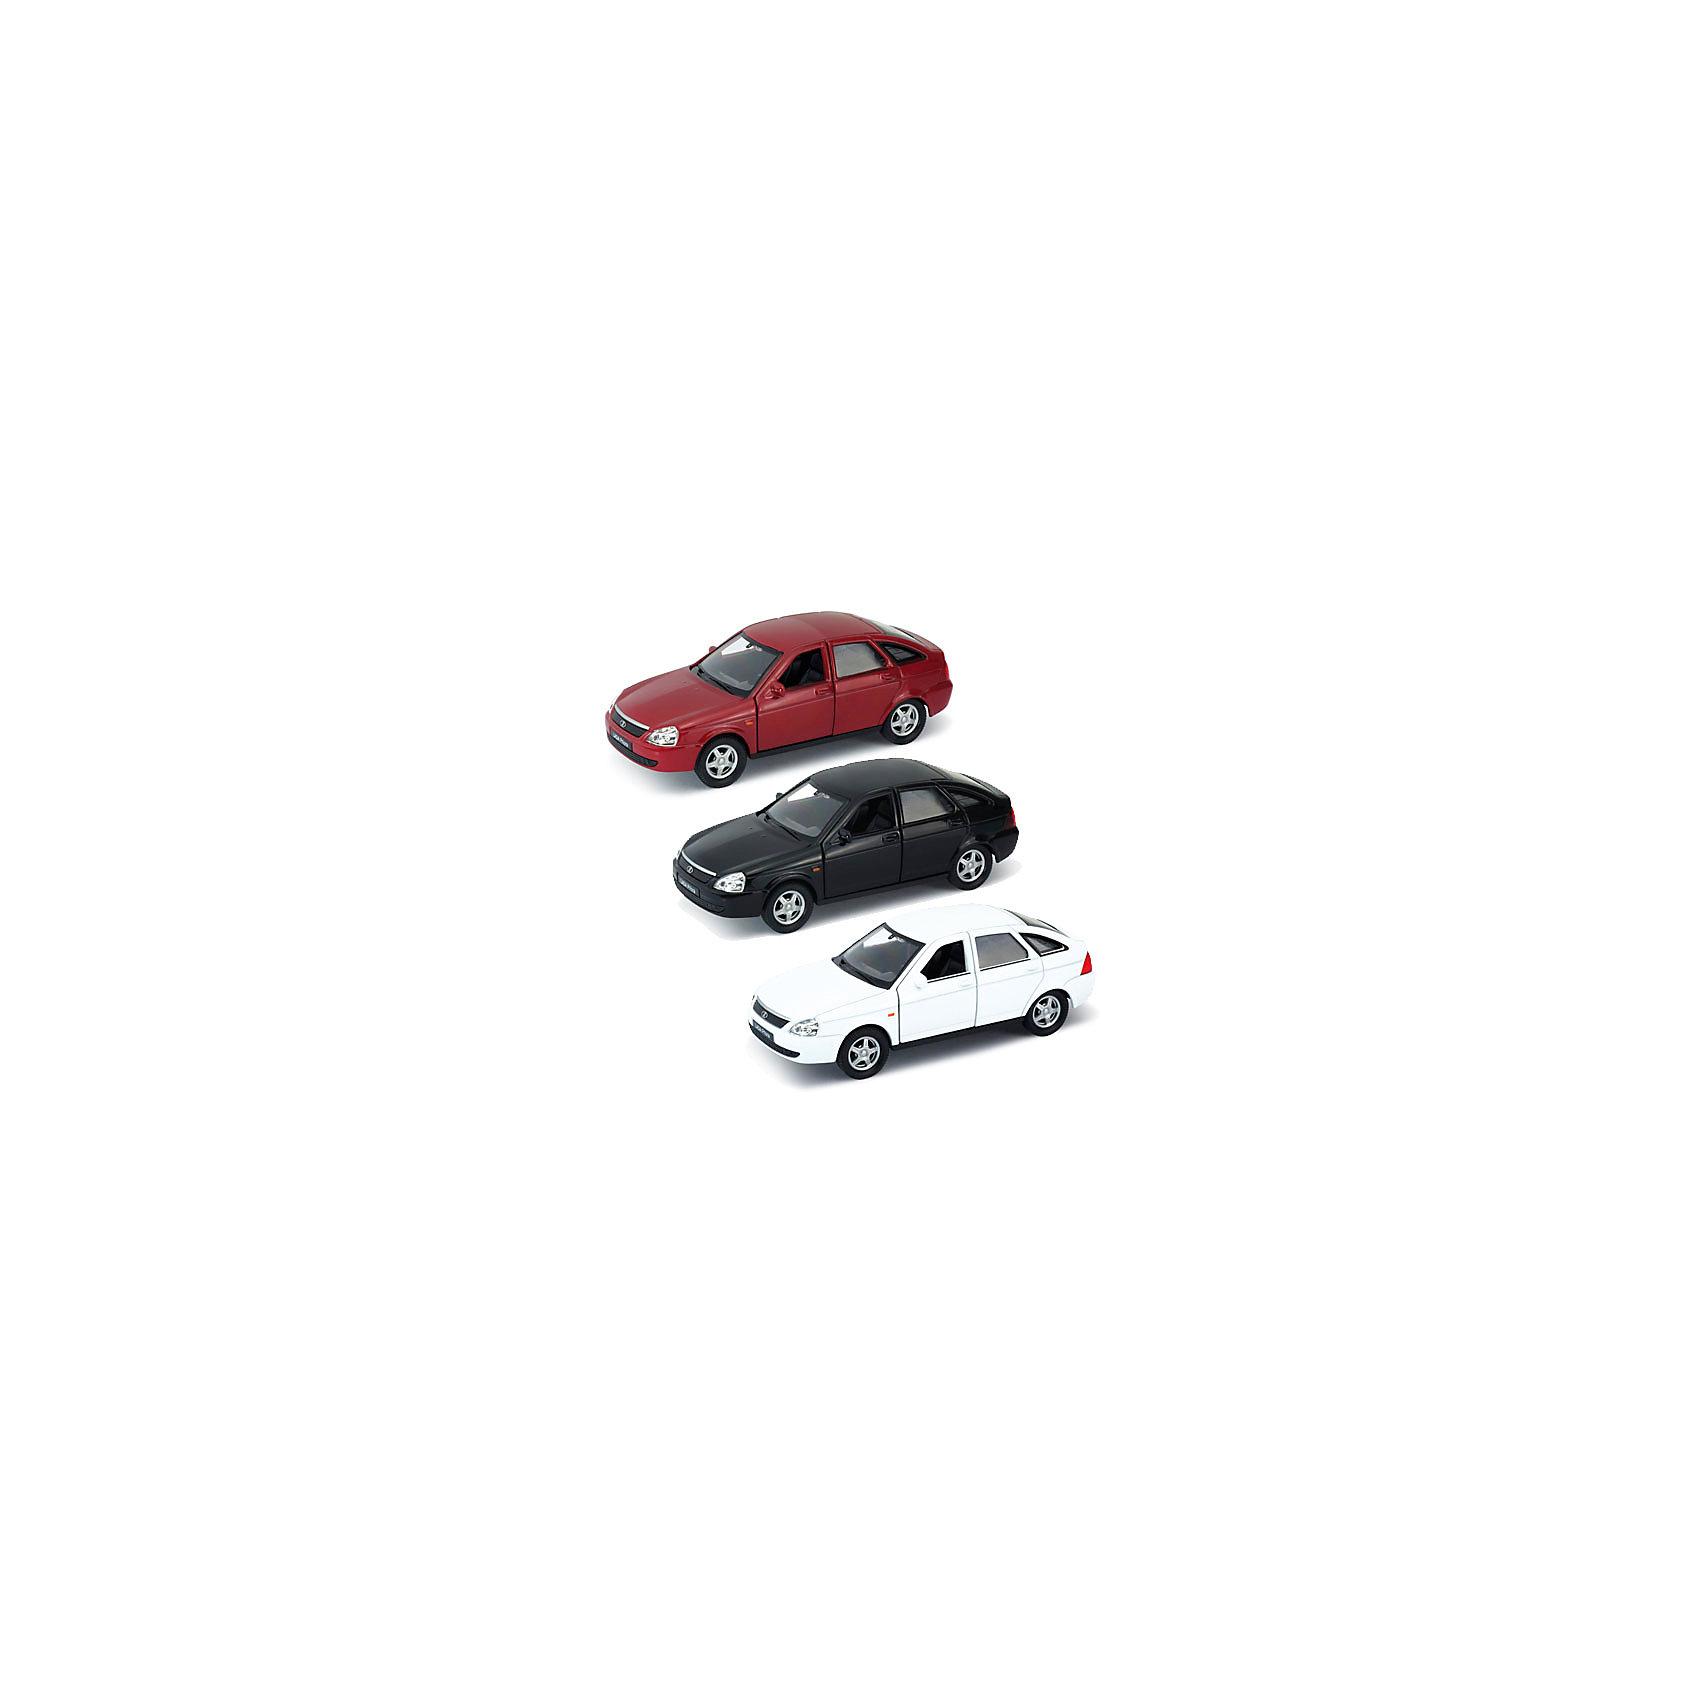 Модель машины  1:34-39 LADA PRIORA, черная, Welly<br><br>Ширина мм: 60<br>Глубина мм: 115<br>Высота мм: 145<br>Вес г: 161<br>Возраст от месяцев: 36<br>Возраст до месяцев: 2147483647<br>Пол: Мужской<br>Возраст: Детский<br>SKU: 5255018